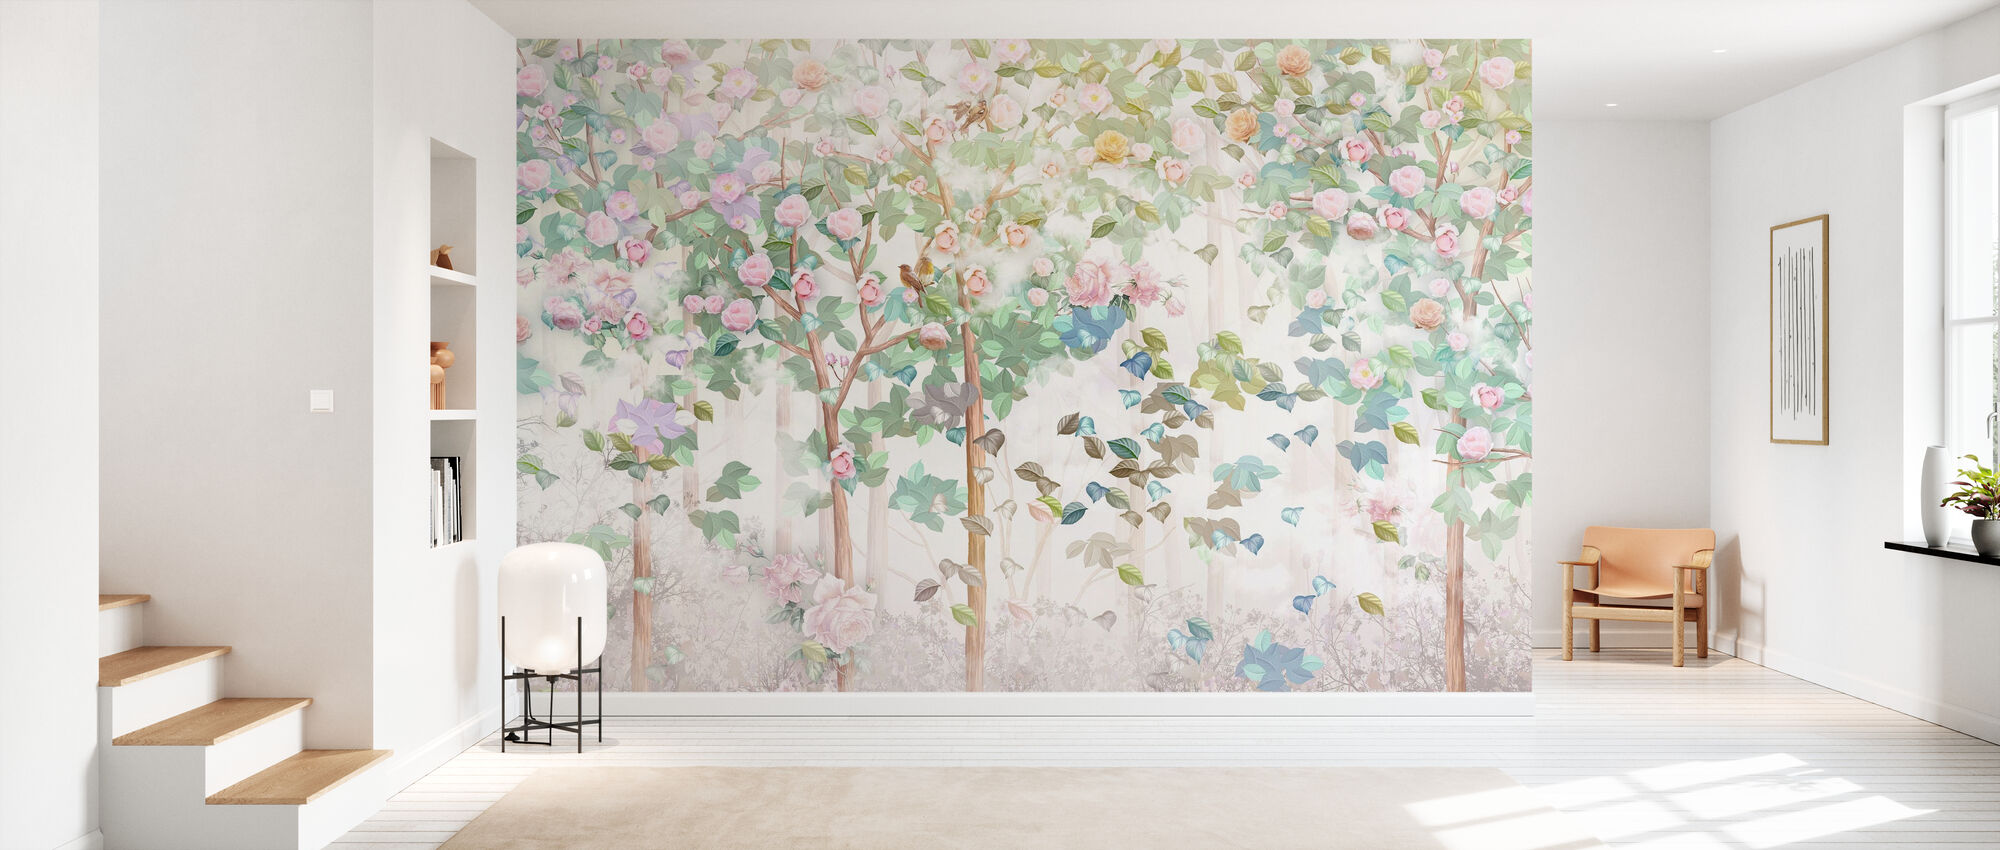 Trees in Bloom - Wallpaper - Hallway